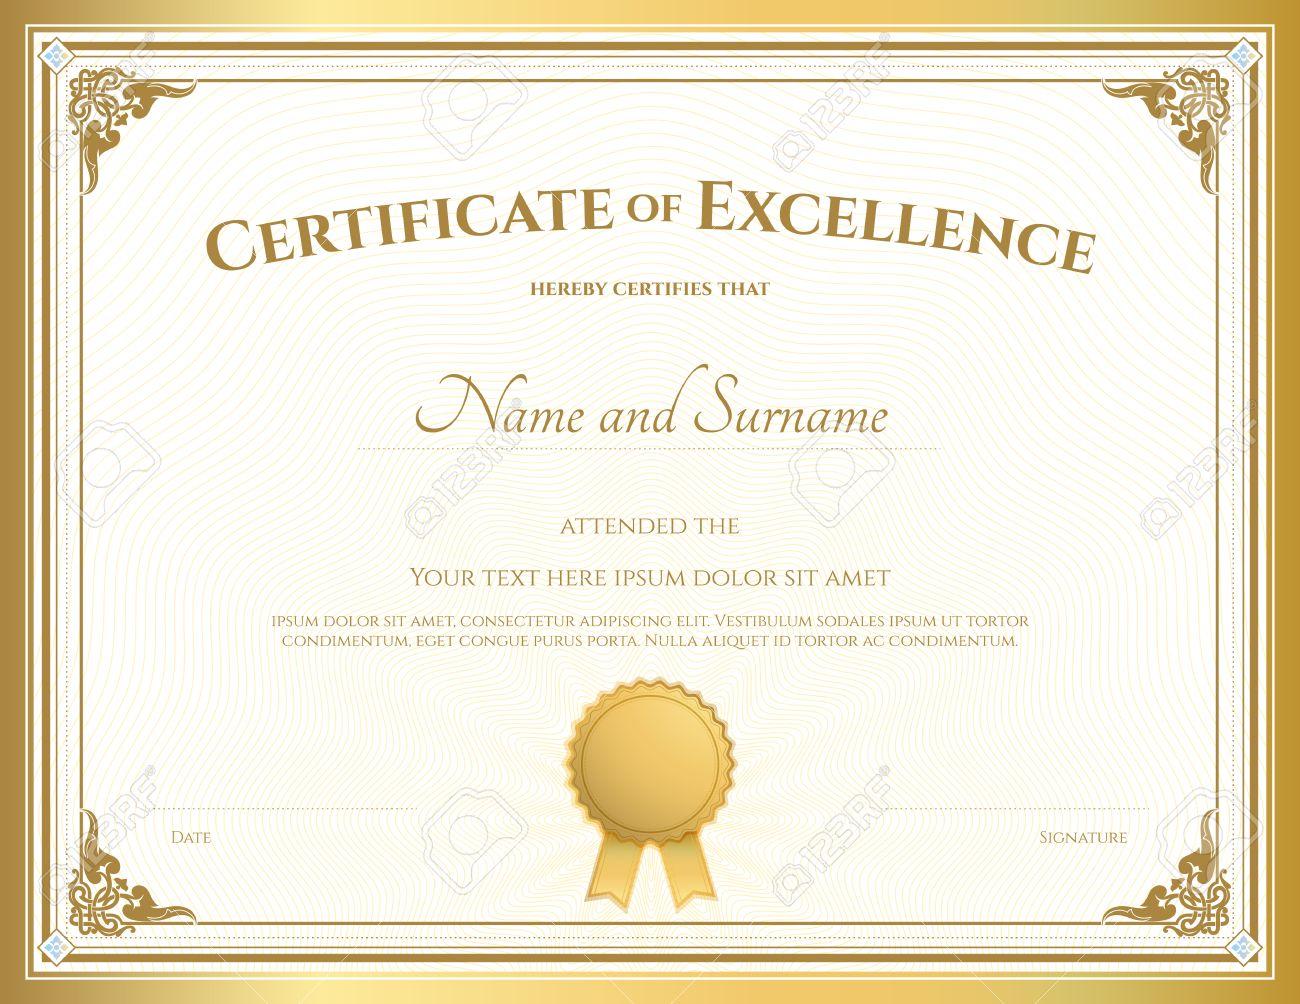 Certification of appreciation wording employee development plan sample wording for certificate of free printable cash receipt template 62194569 certificate of appreciation template with yadclub Images